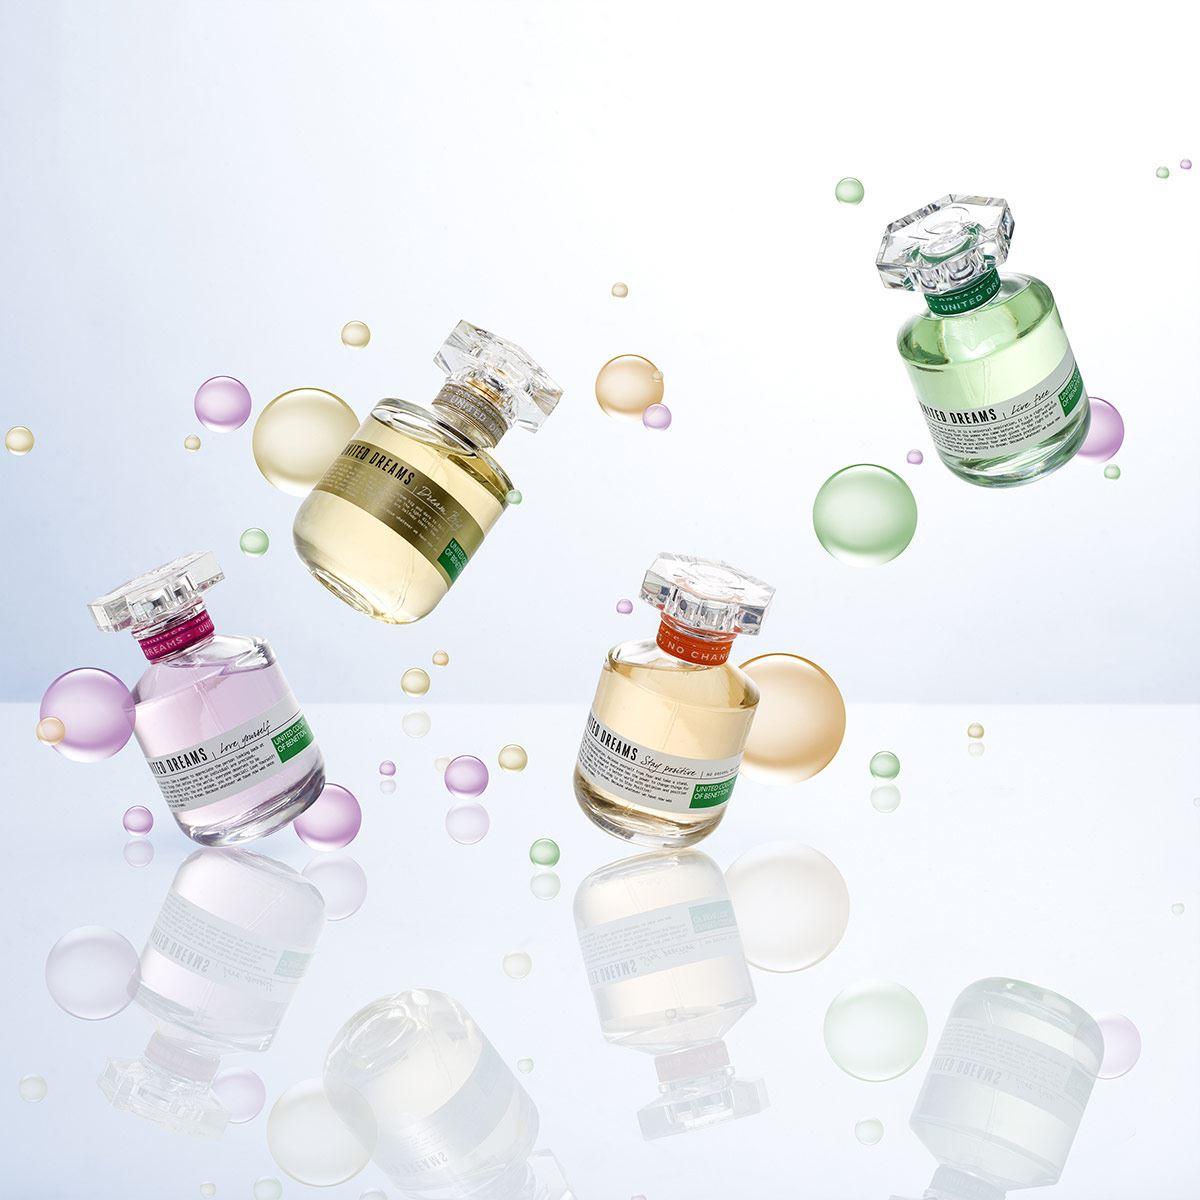 Set para dama, Benetton, United Dreams Live Free, EDT 80 ml + Desodorante 150 ml + Body Lotion 75 ml + Travel Spray 10 ml